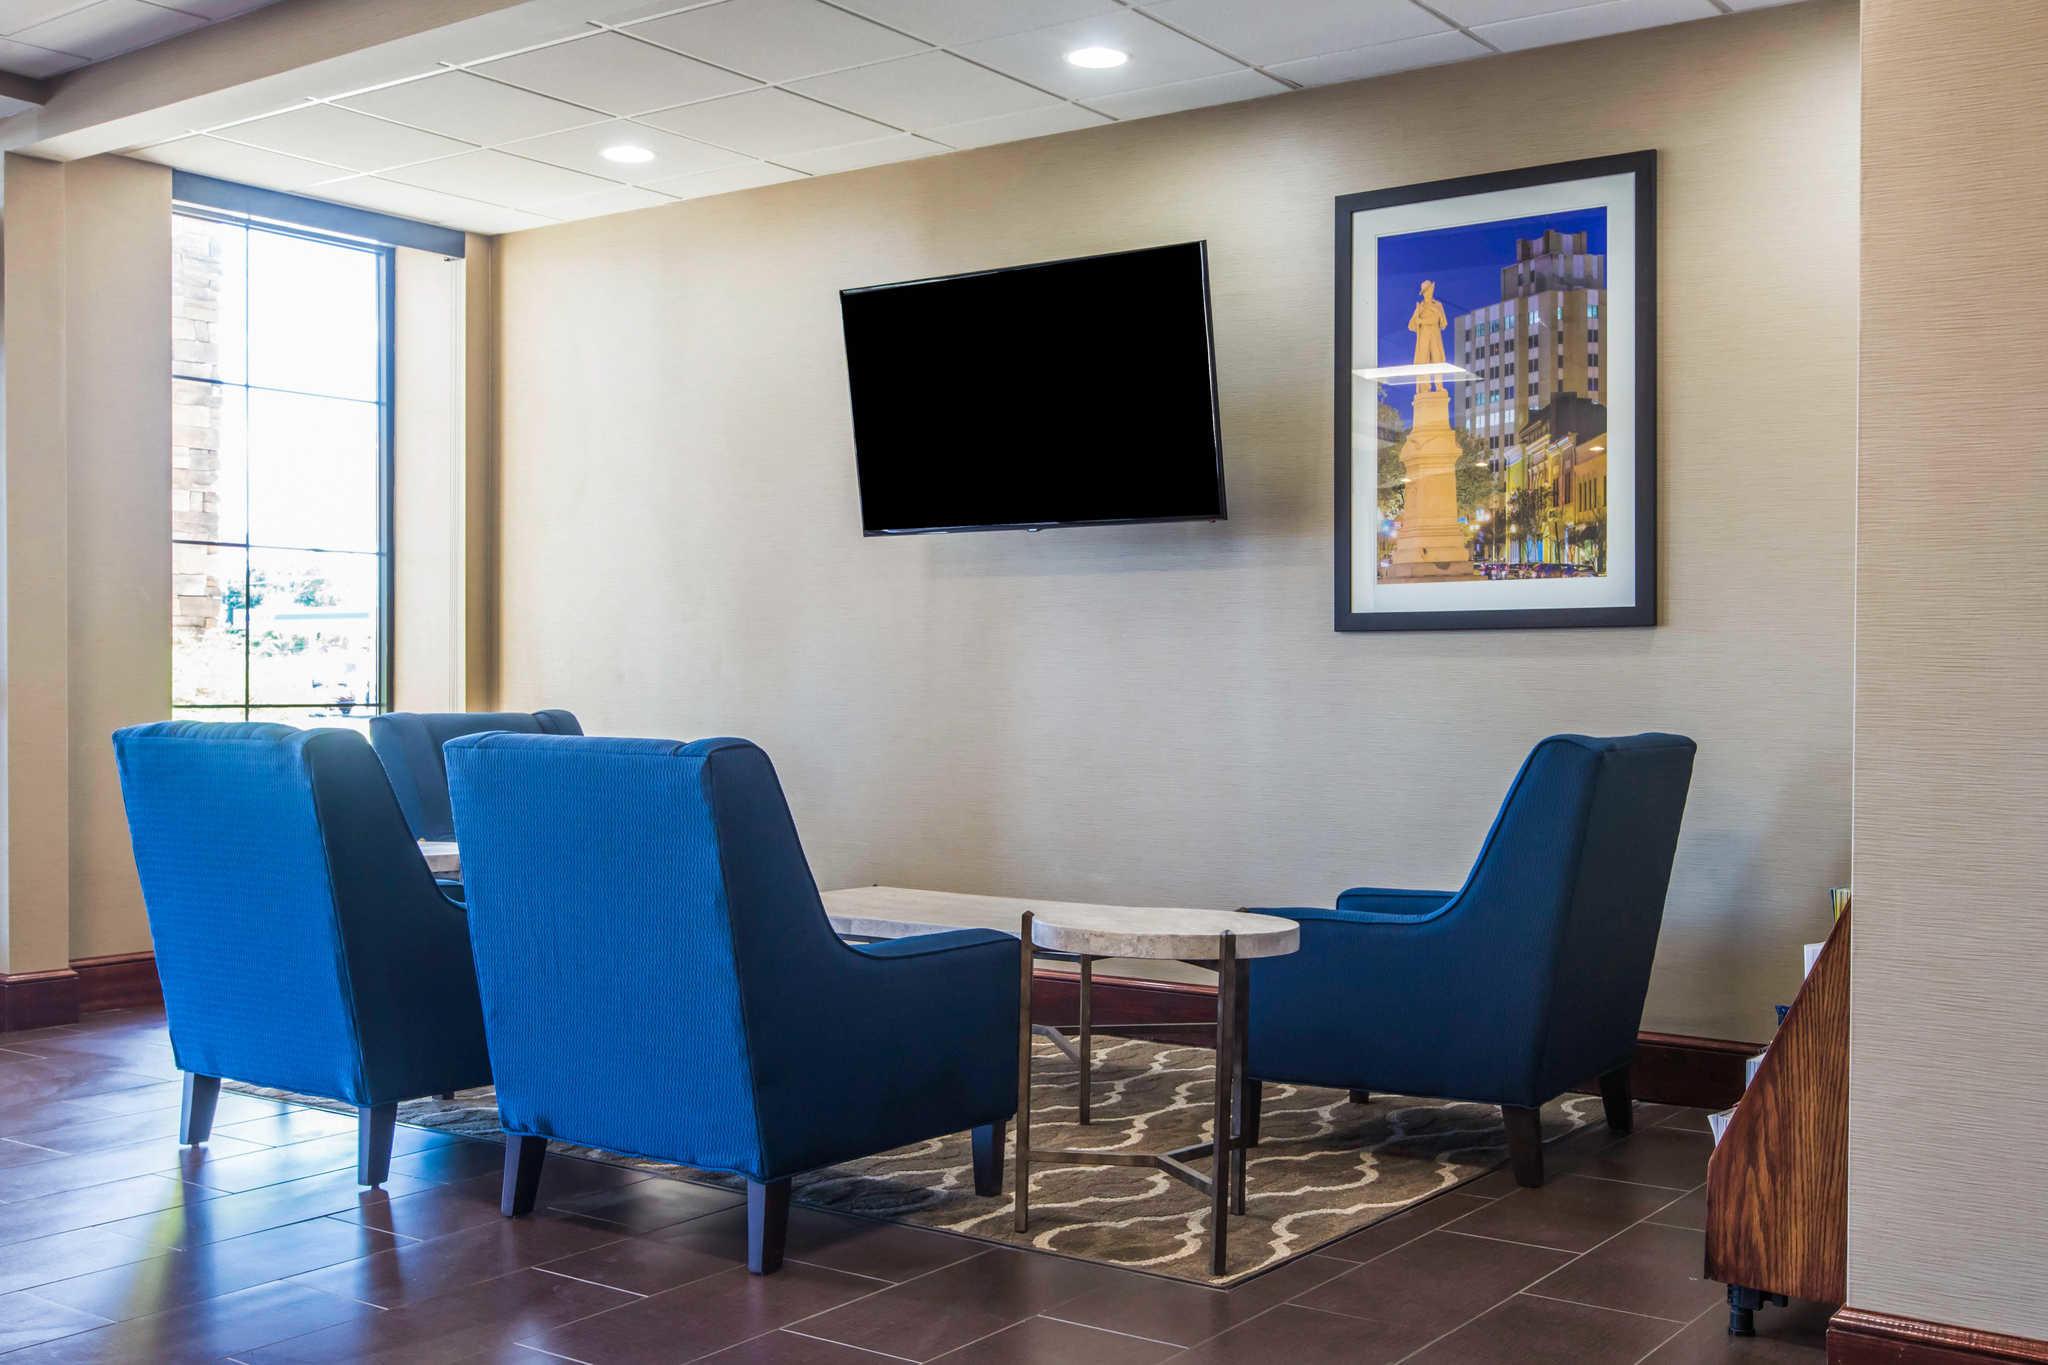 Comfort Inn & Suites West image 3